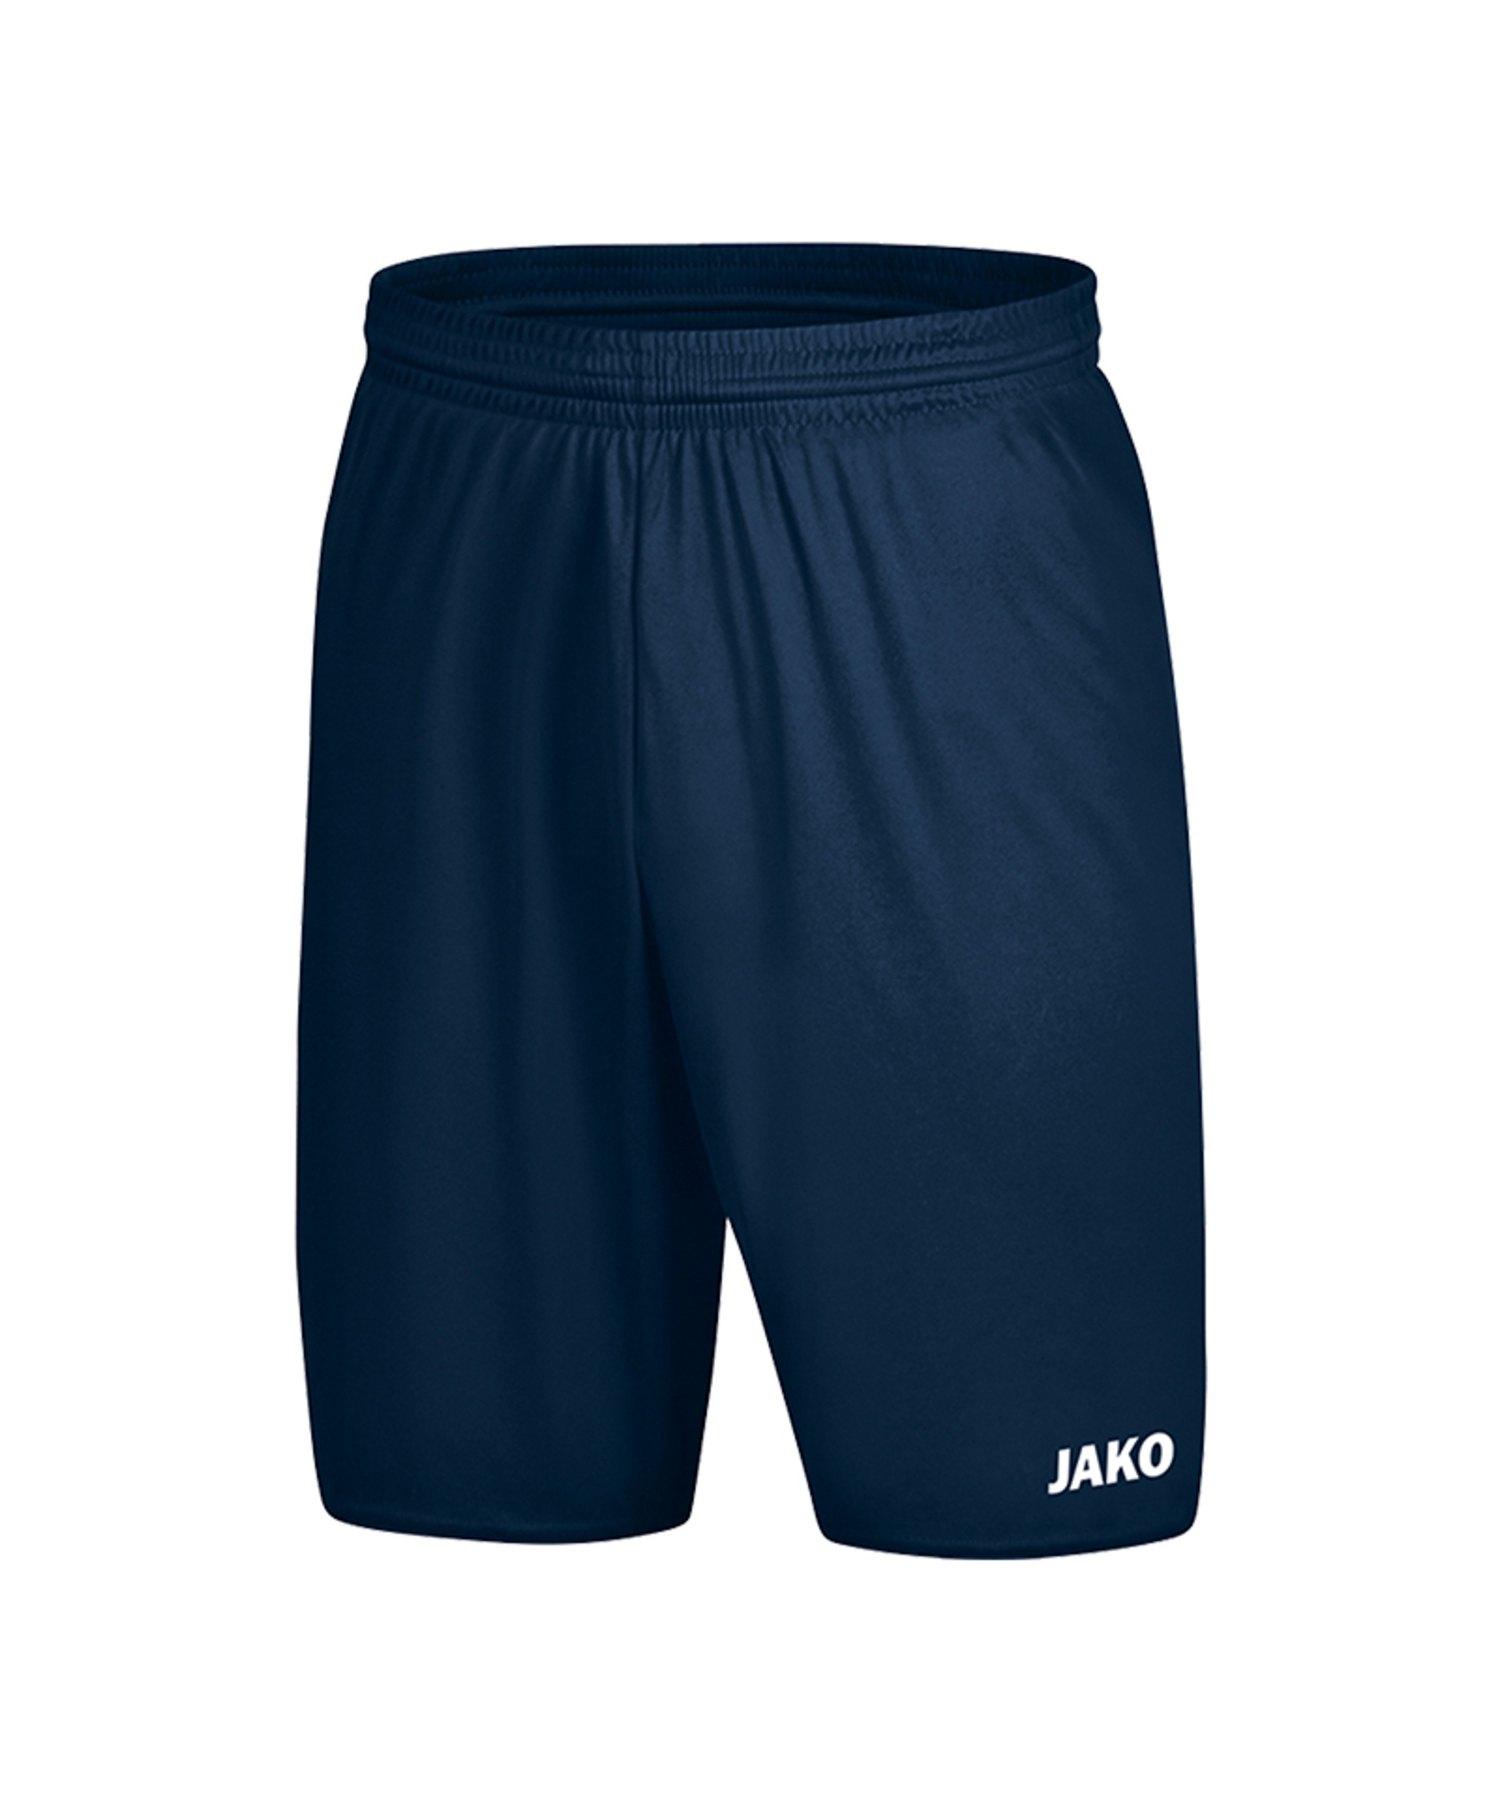 Jako Manchester 2.0 Short ohne Innenslip Blau F90 - Blau